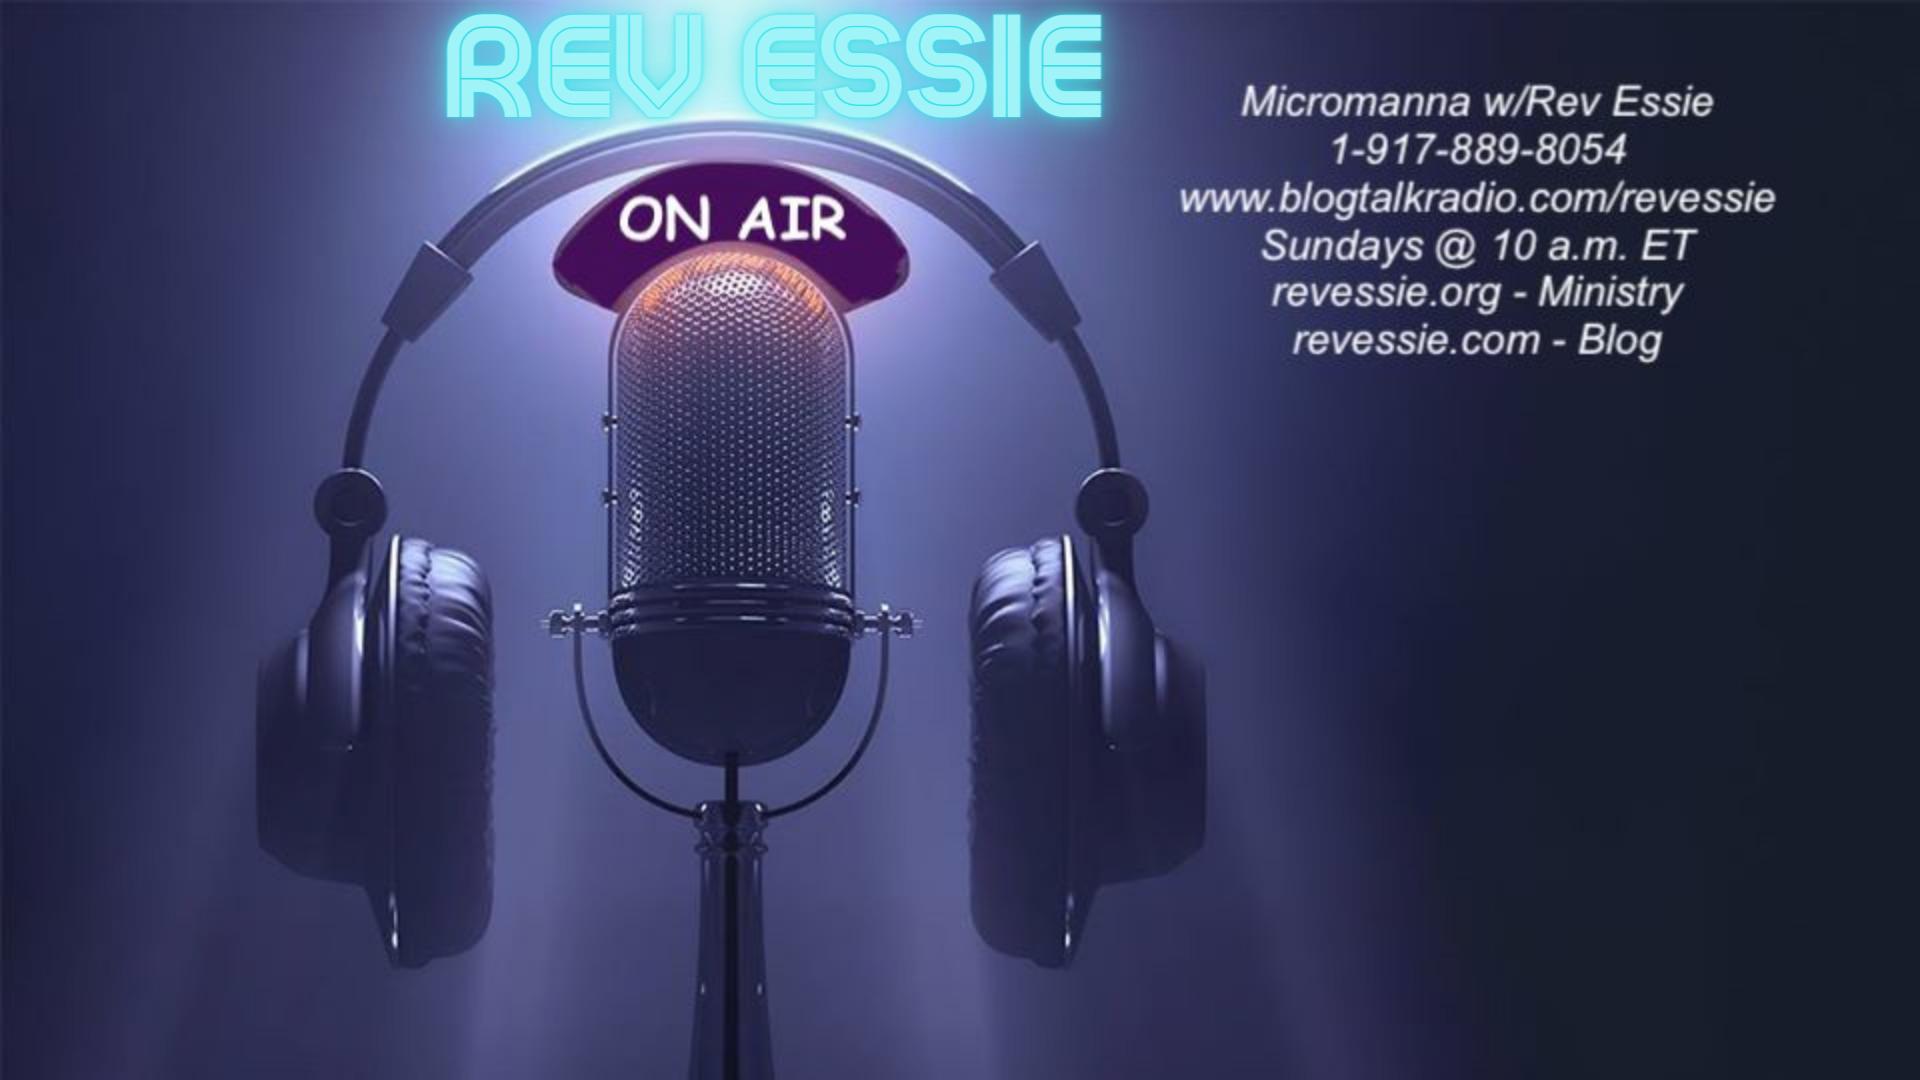 rev-essie-on-air-4.1221-2